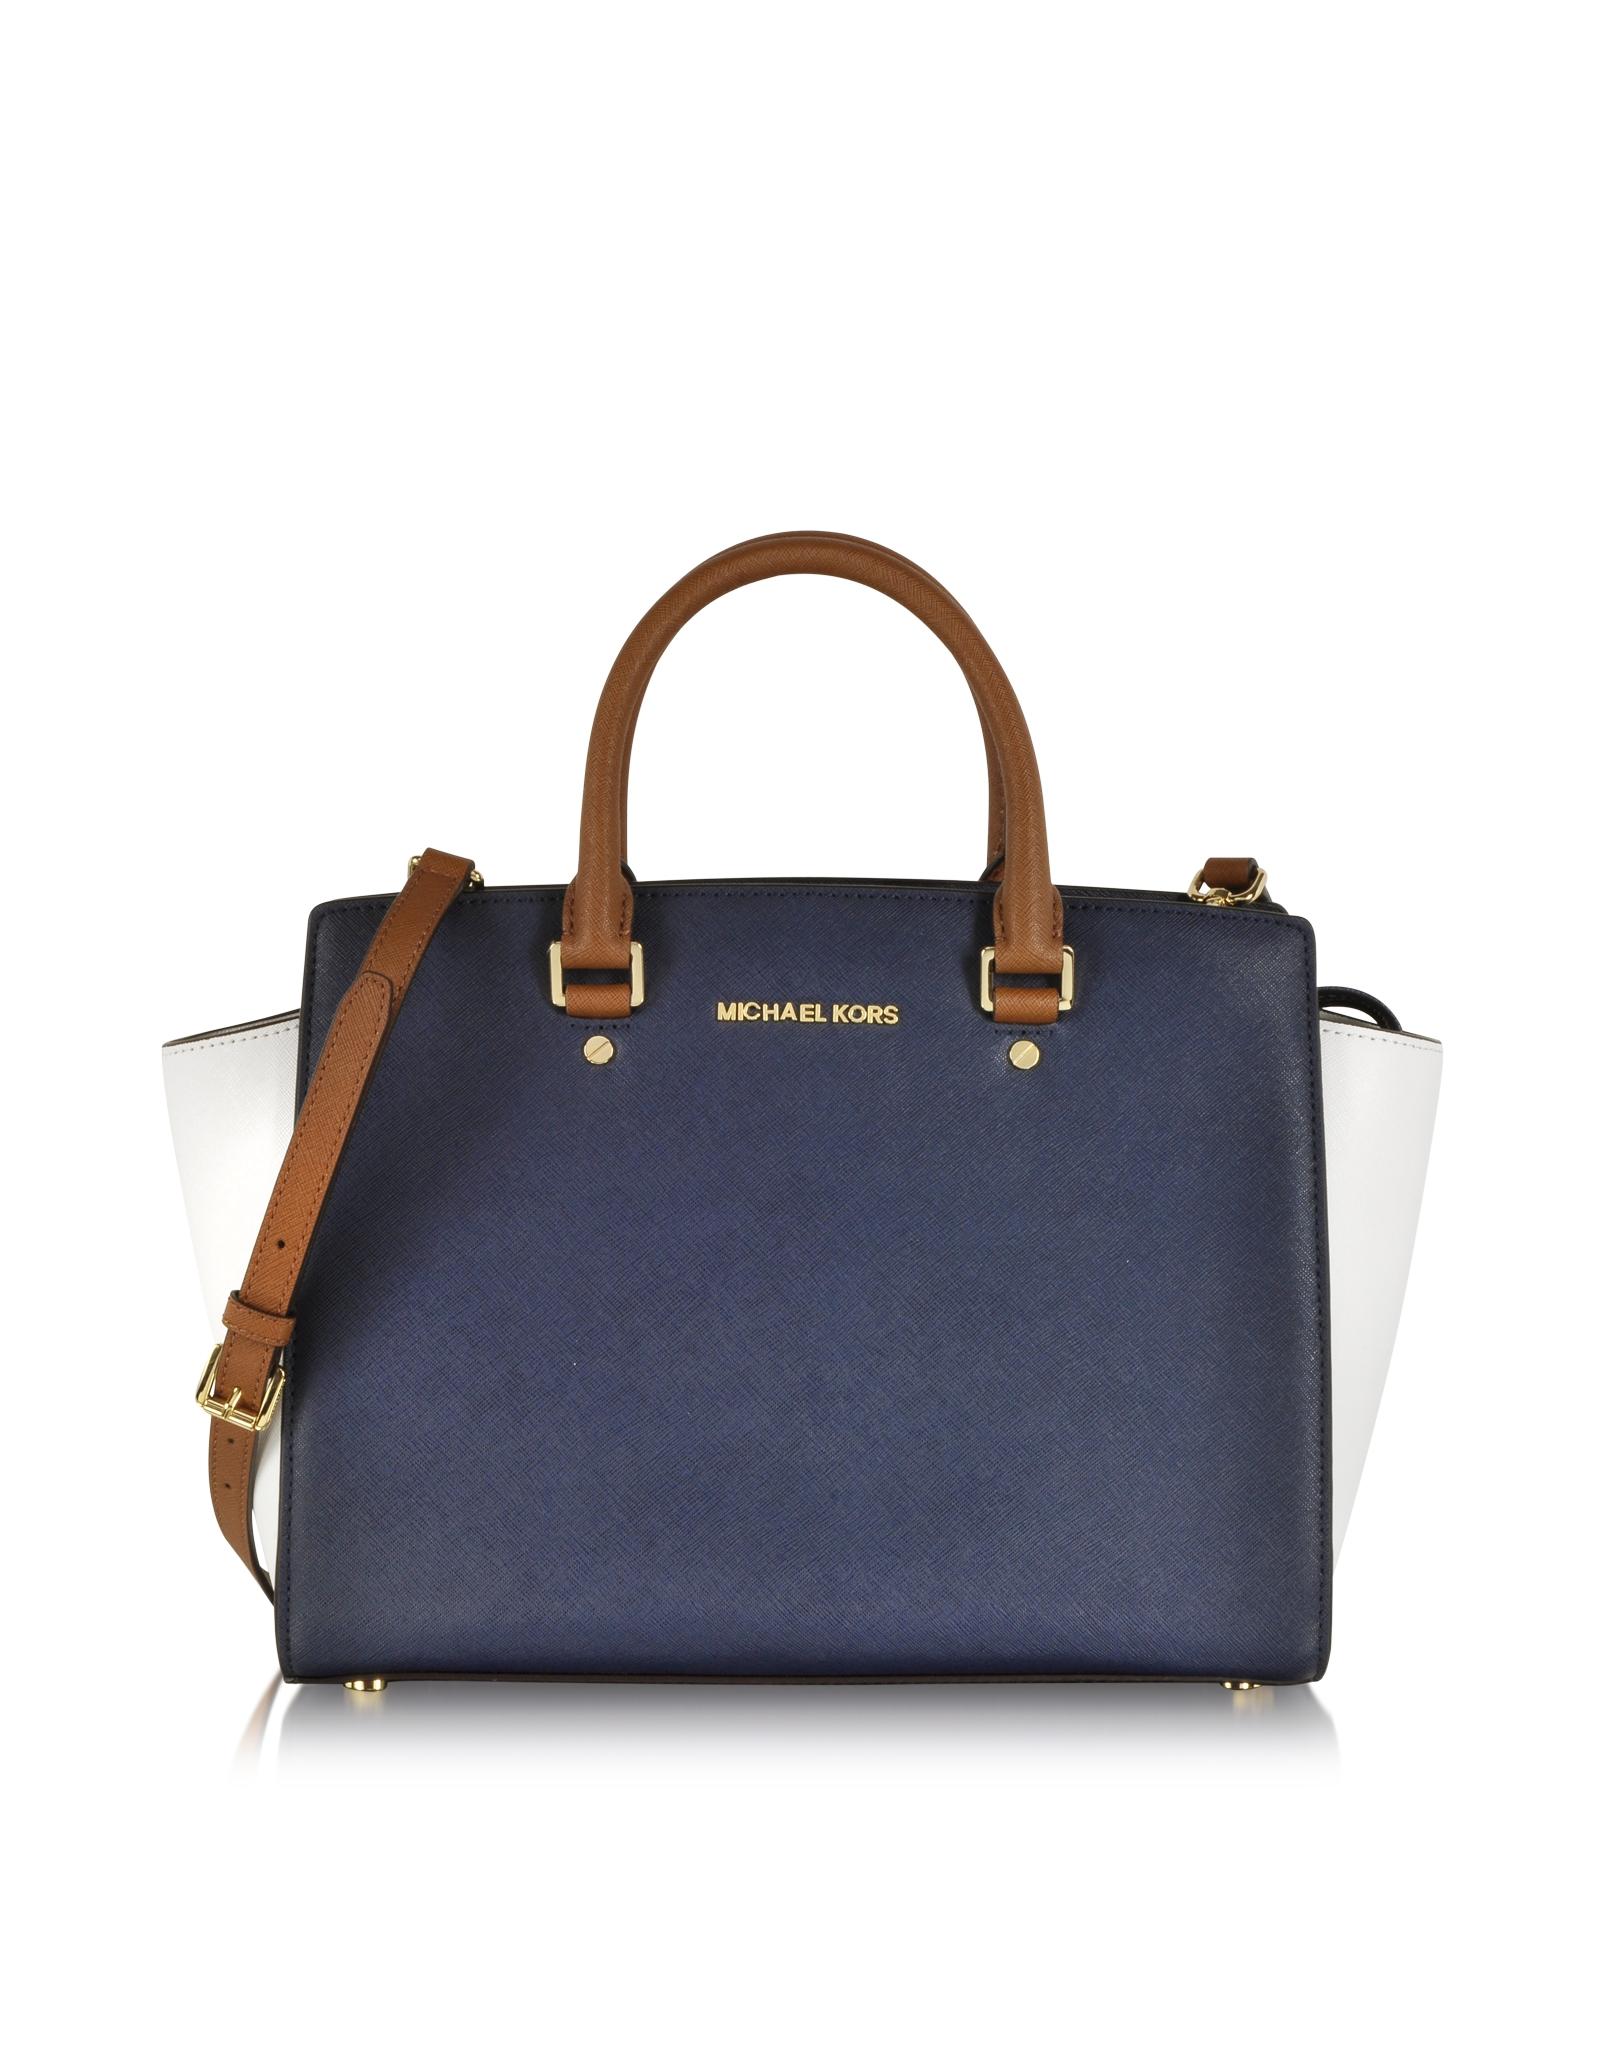 michael kors large selma topzip tricolor satchel in blue. Black Bedroom Furniture Sets. Home Design Ideas